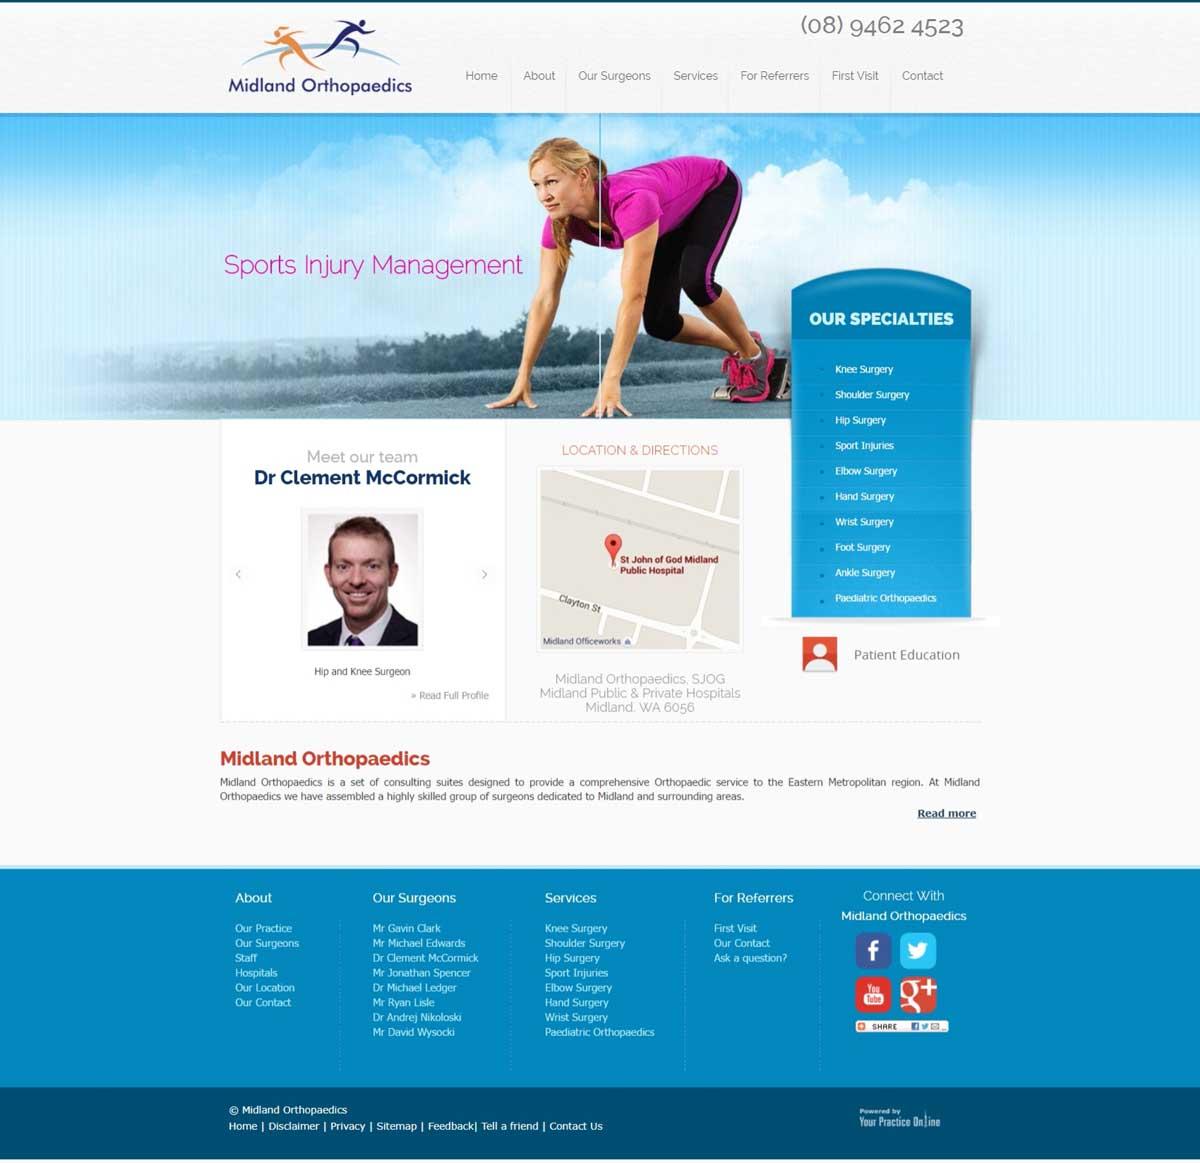 Perth Orthopaedic Surgeons Website